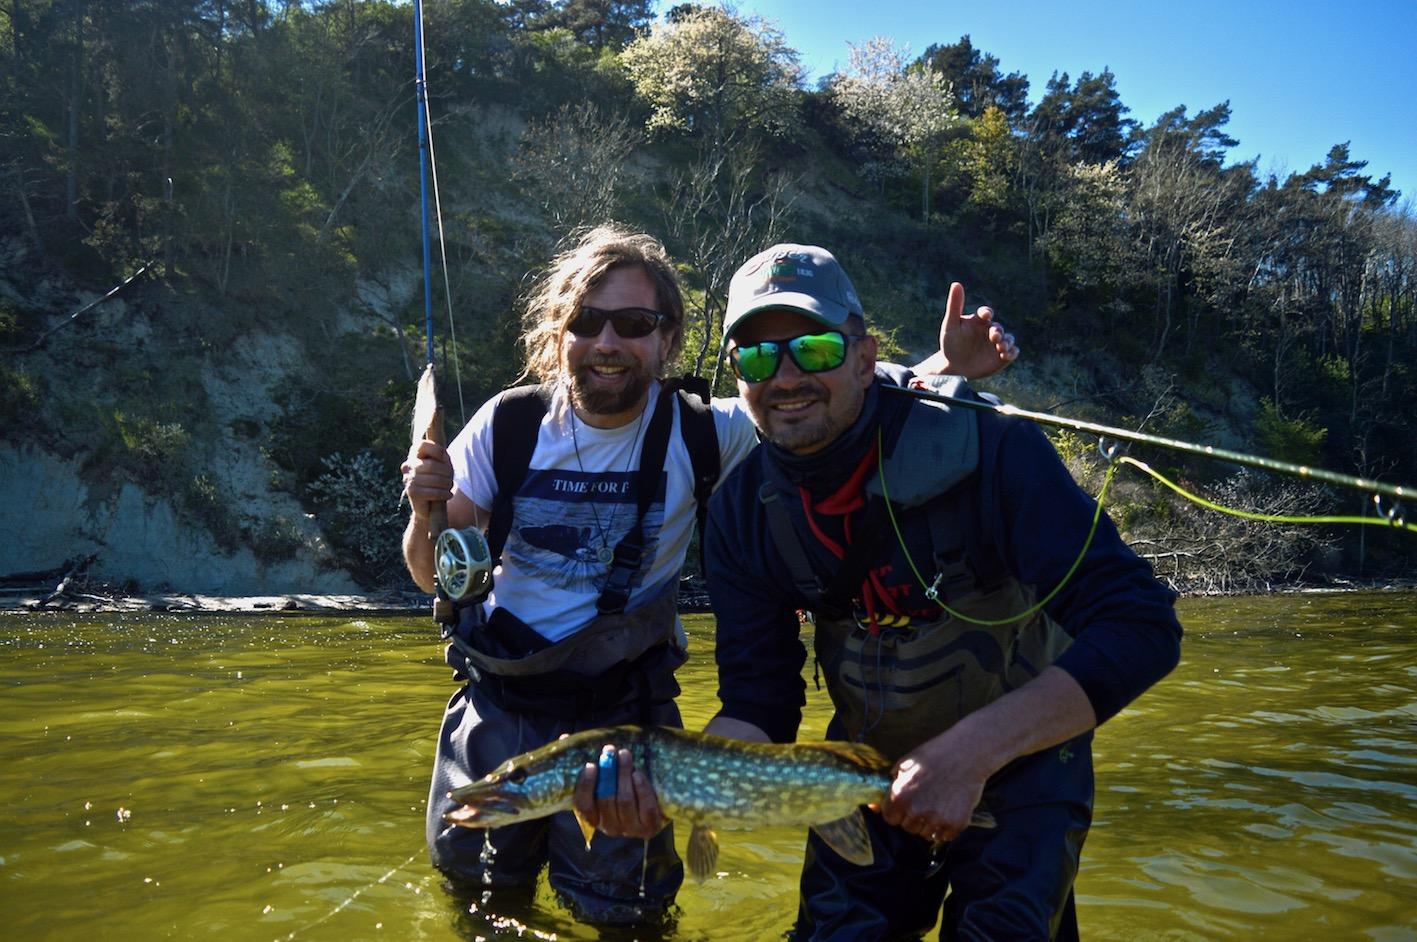 Peter Wollrab Guide bei Fliegenfischerschule FLYRUS